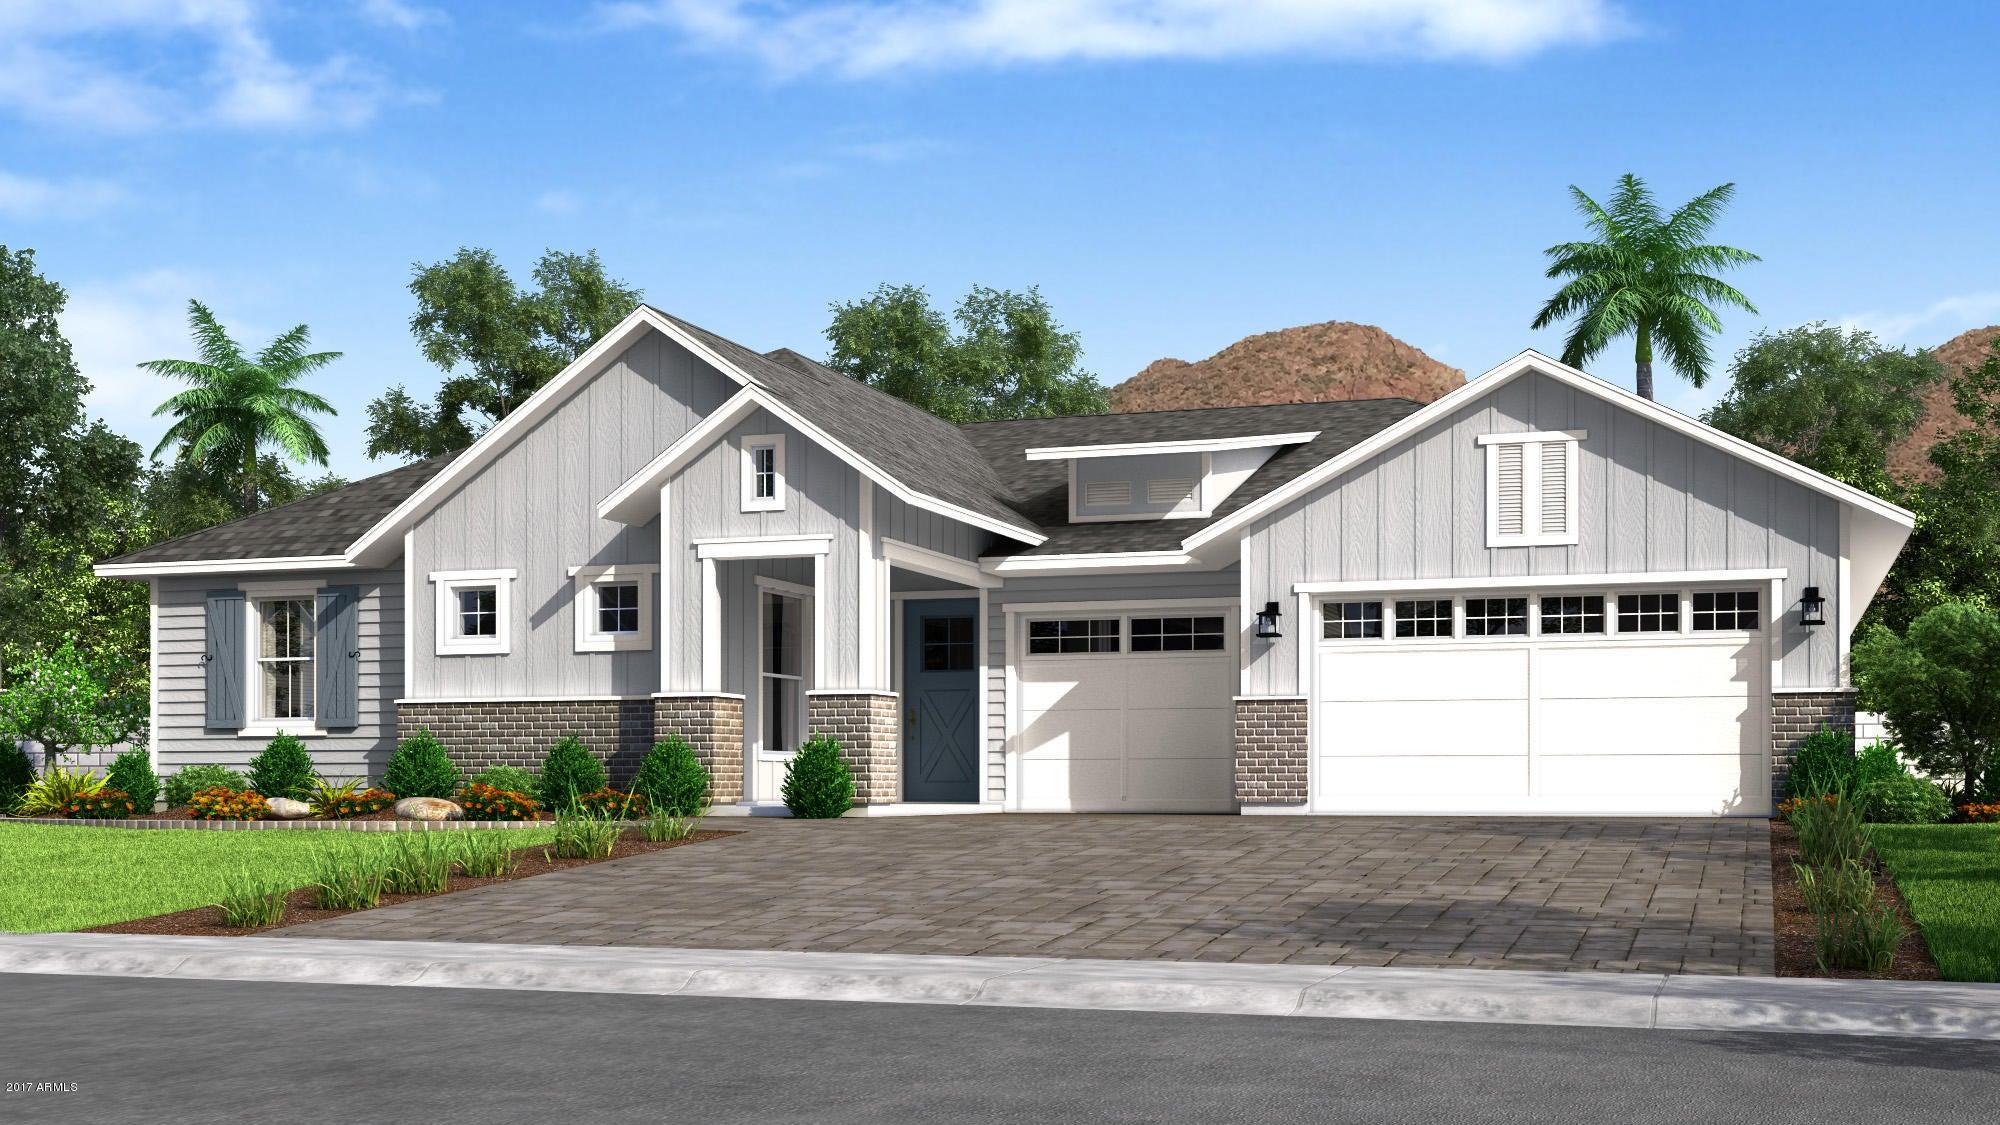 3710 Orange Drive,Phoenix,Arizona 85018,4 Bedrooms Bedrooms,3.5 BathroomsBathrooms,Residential,Orange,5690445